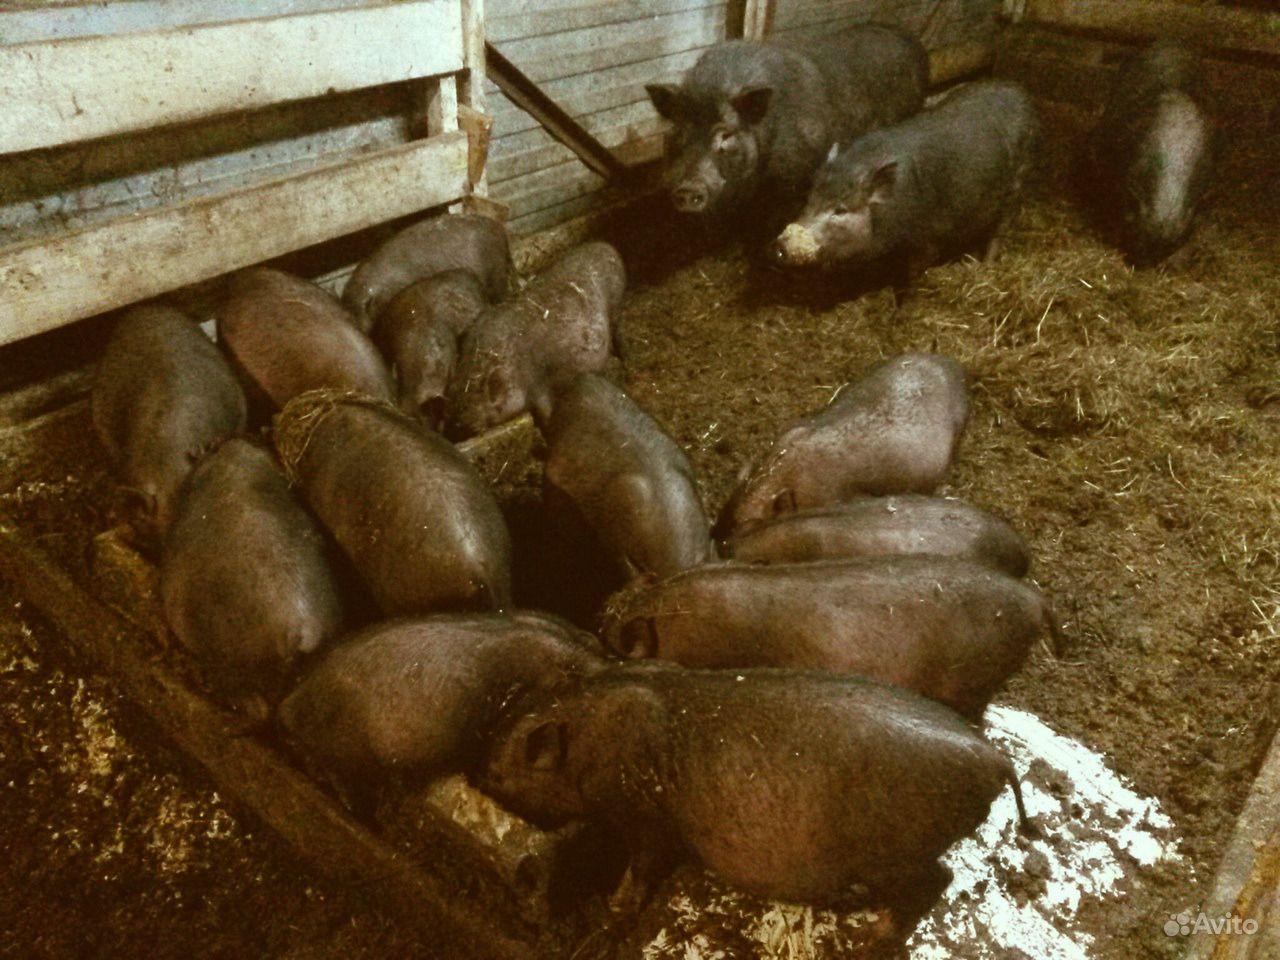 Вьетнамские вислобрюхие поросята и свиноматка